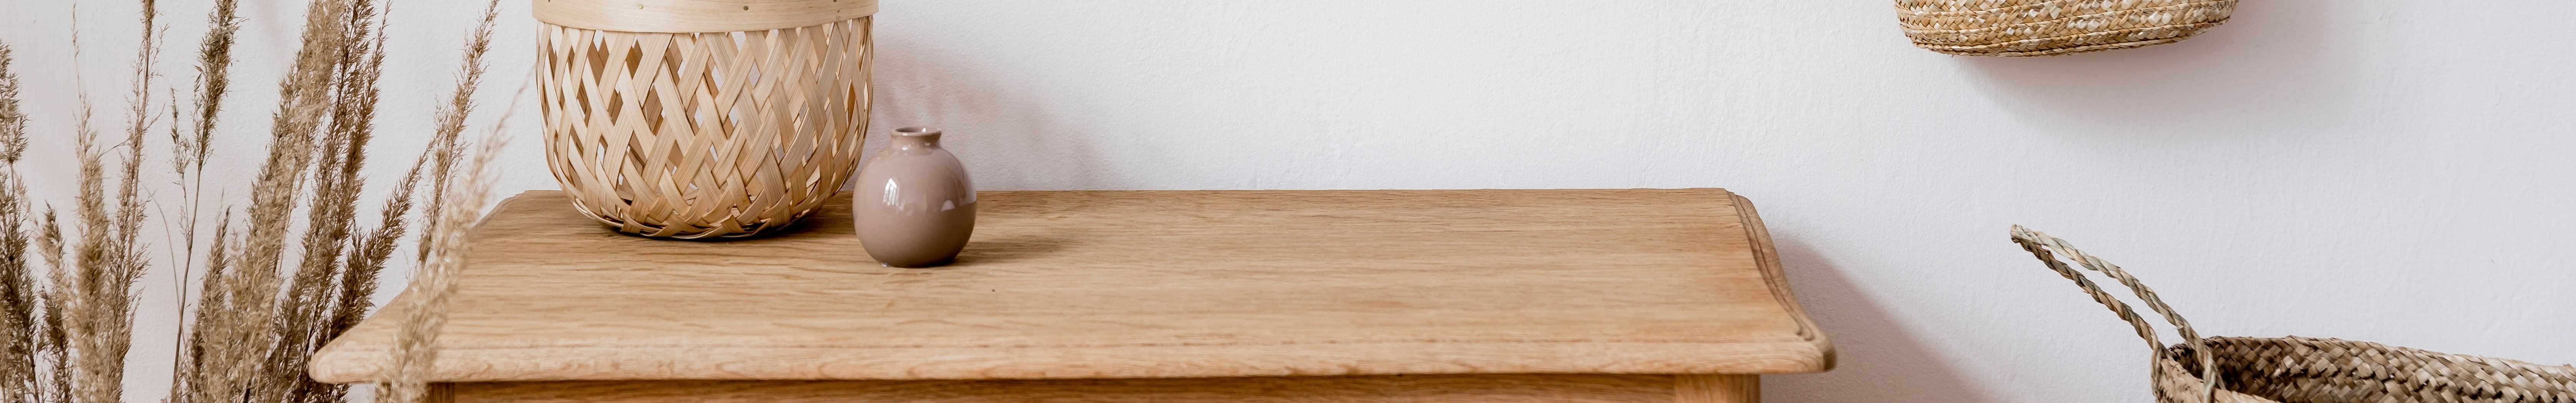 Stock Image Of Wooden Table at Woodbridge Apartments, Chesapeake, Virginia